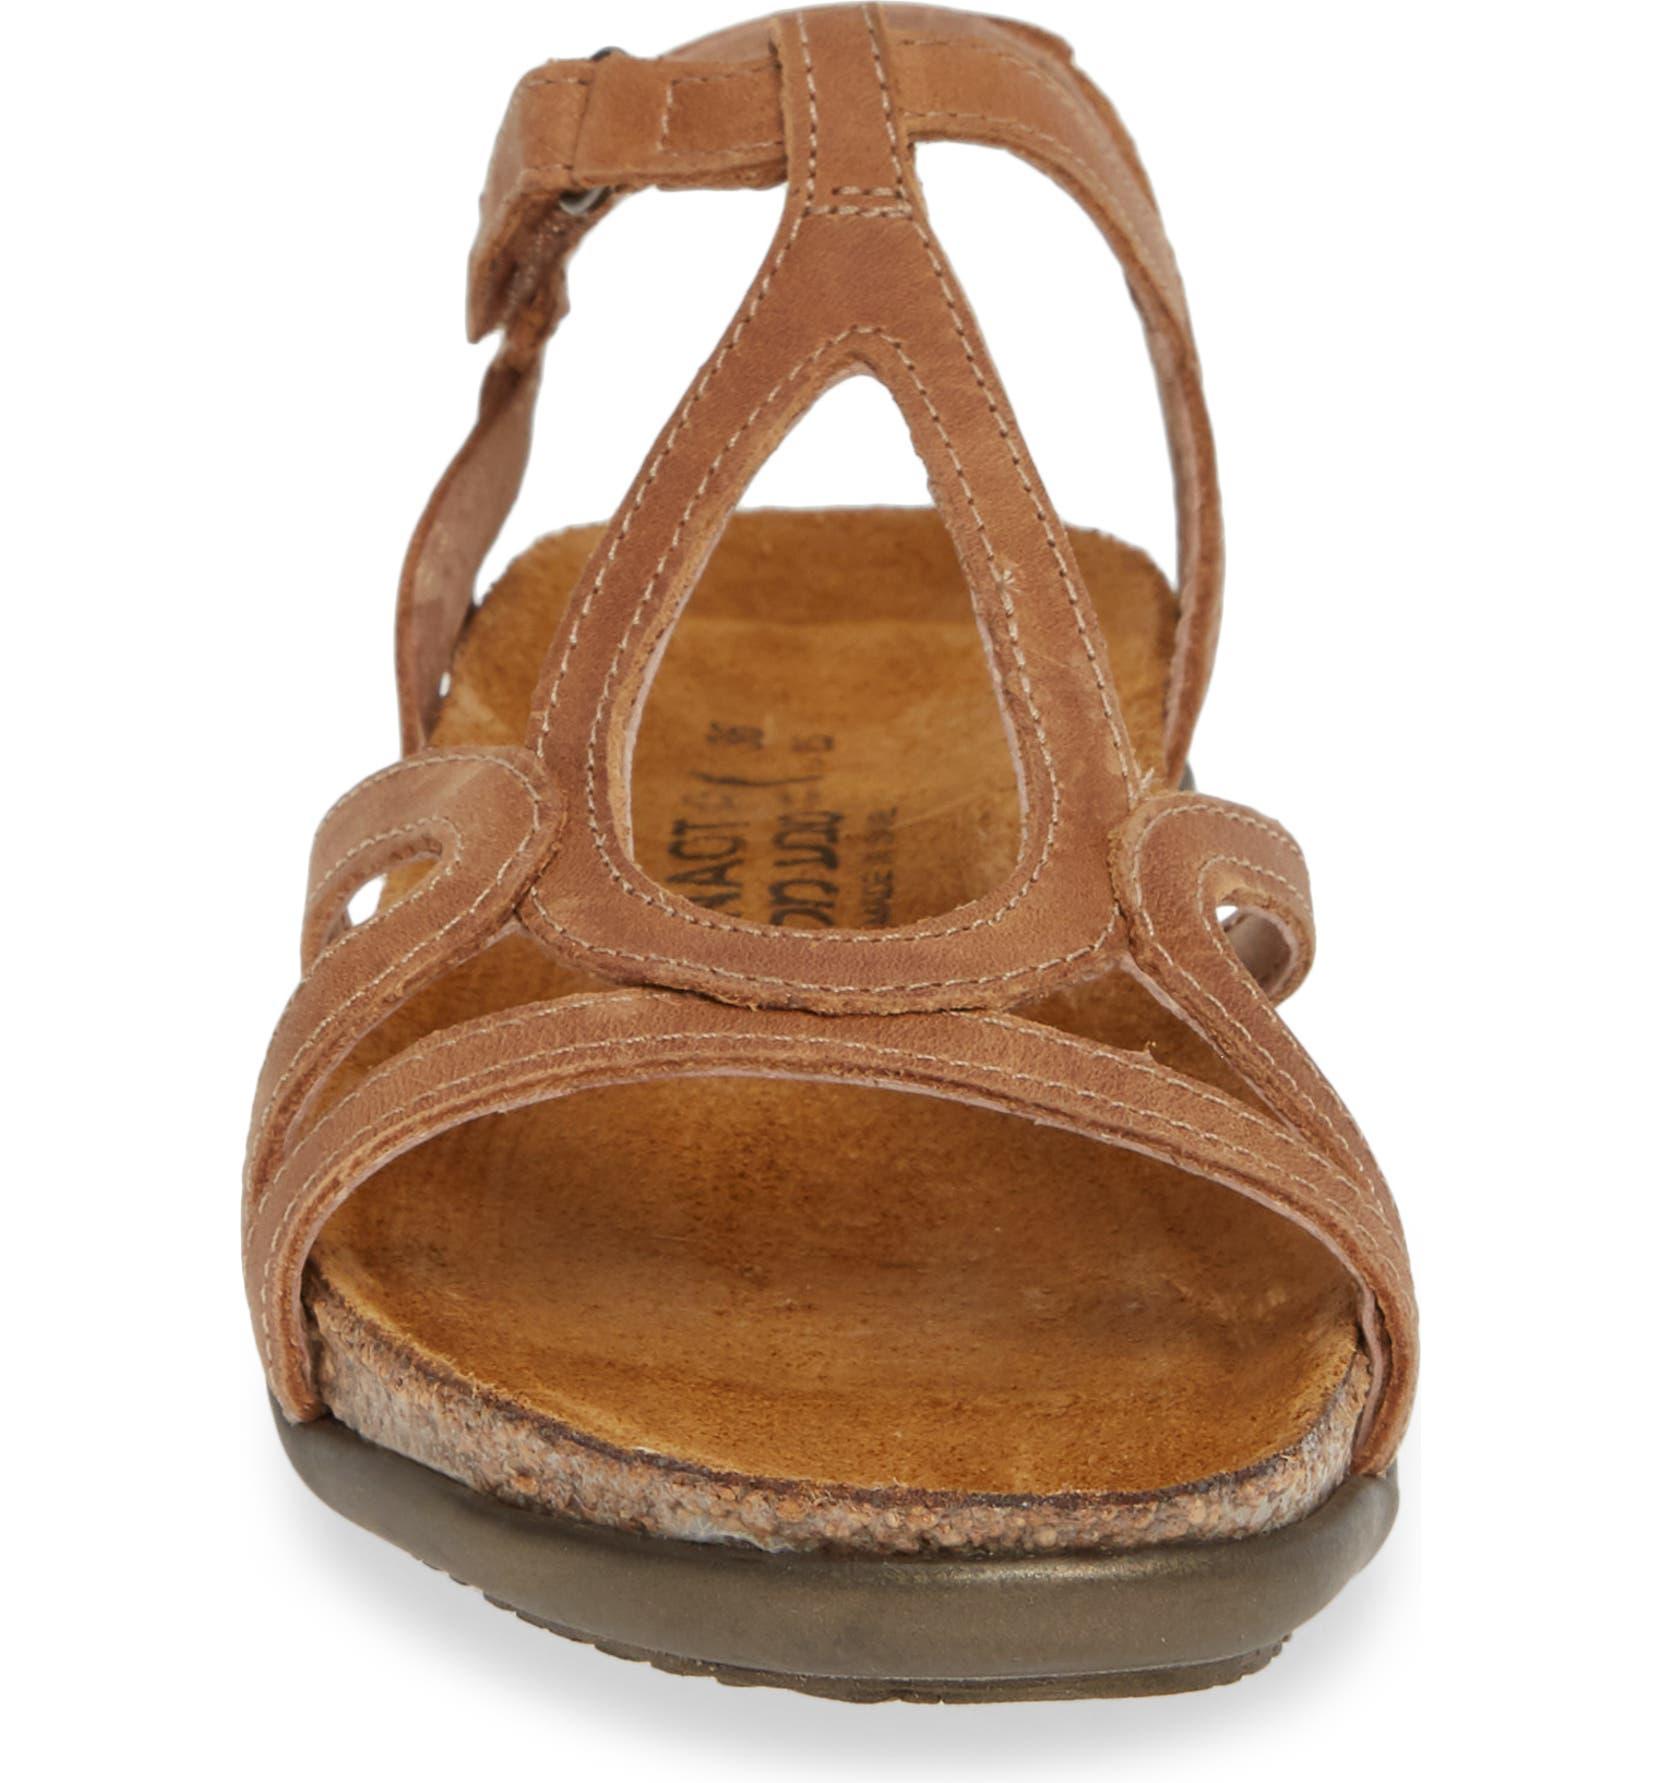 5f80a3a7db4 Naot  Dorith  Sandal